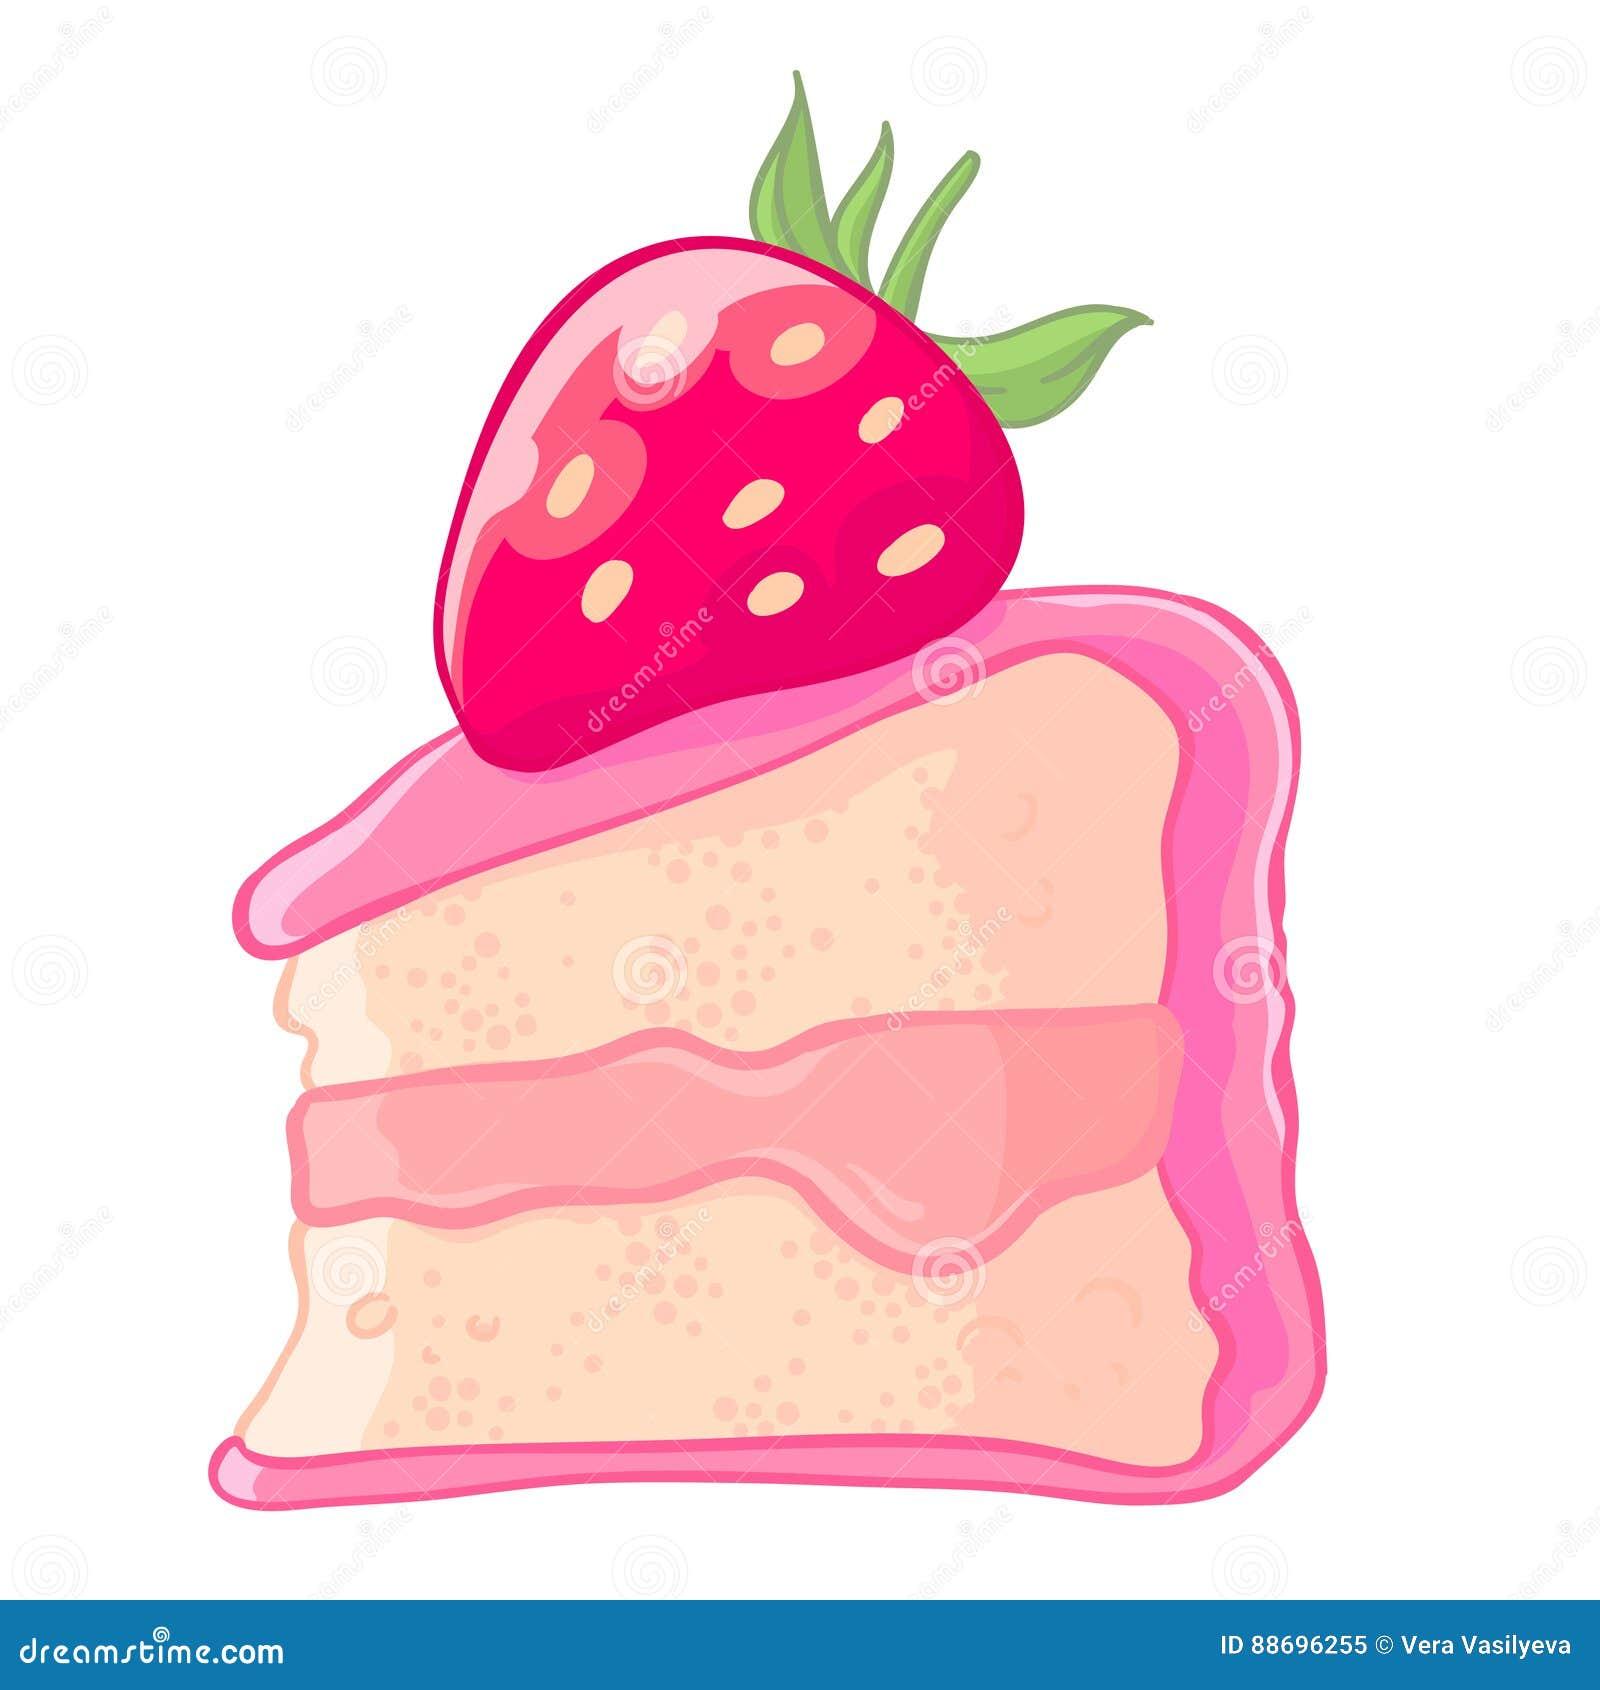 Strawberry Cake Cartoon Images : Cartoon Icon Of A Slice Of Strawberry Sponge Cake With Jam ...